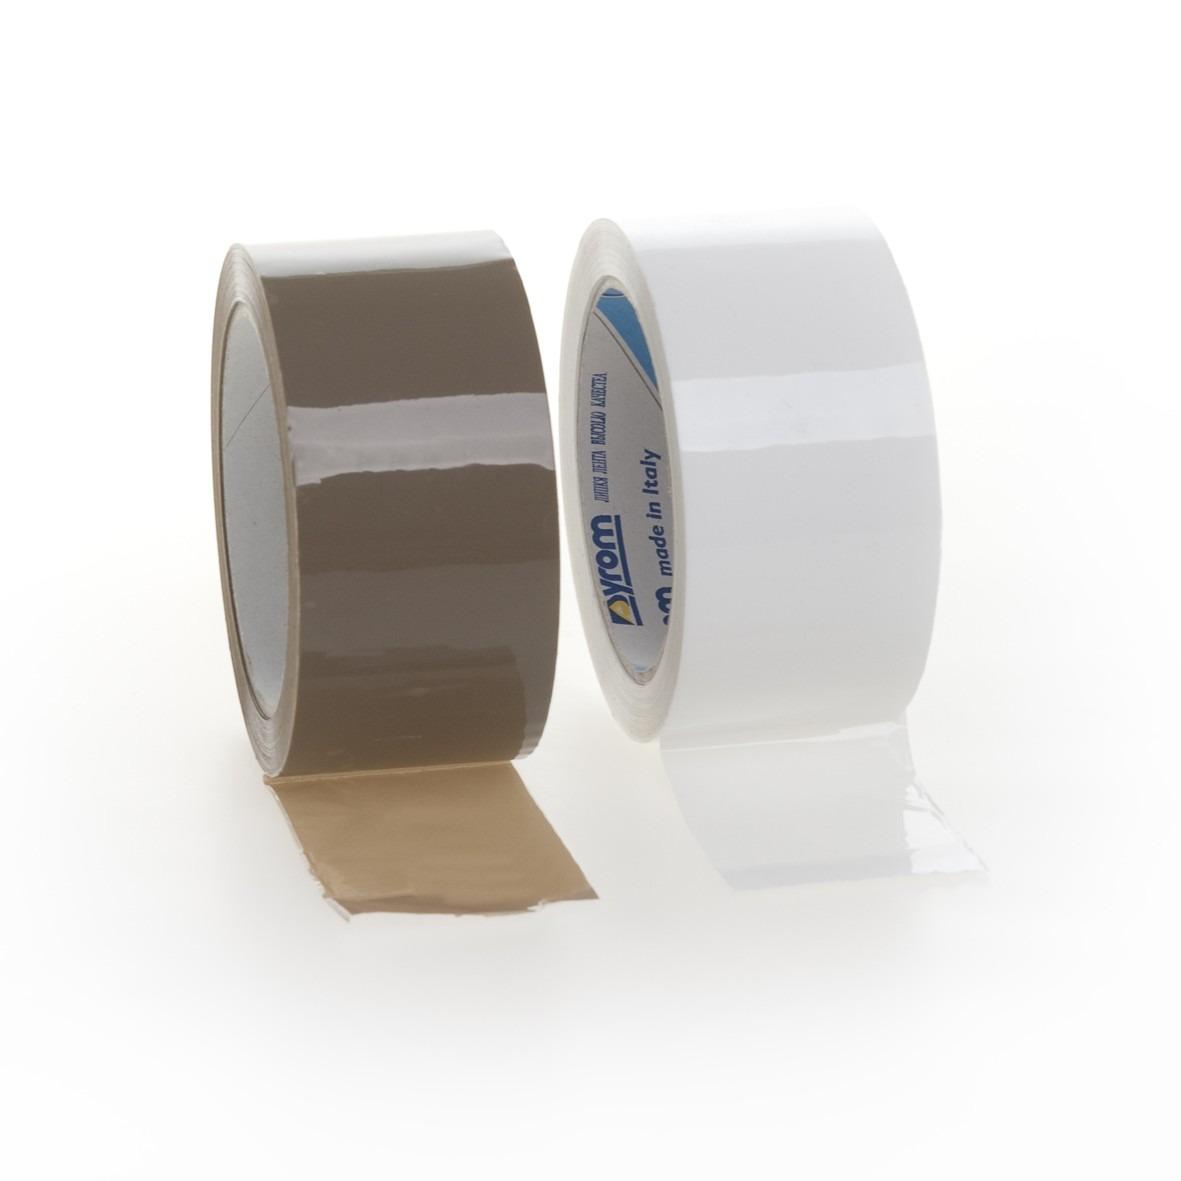 Nastro Adesivo da Imballaggio